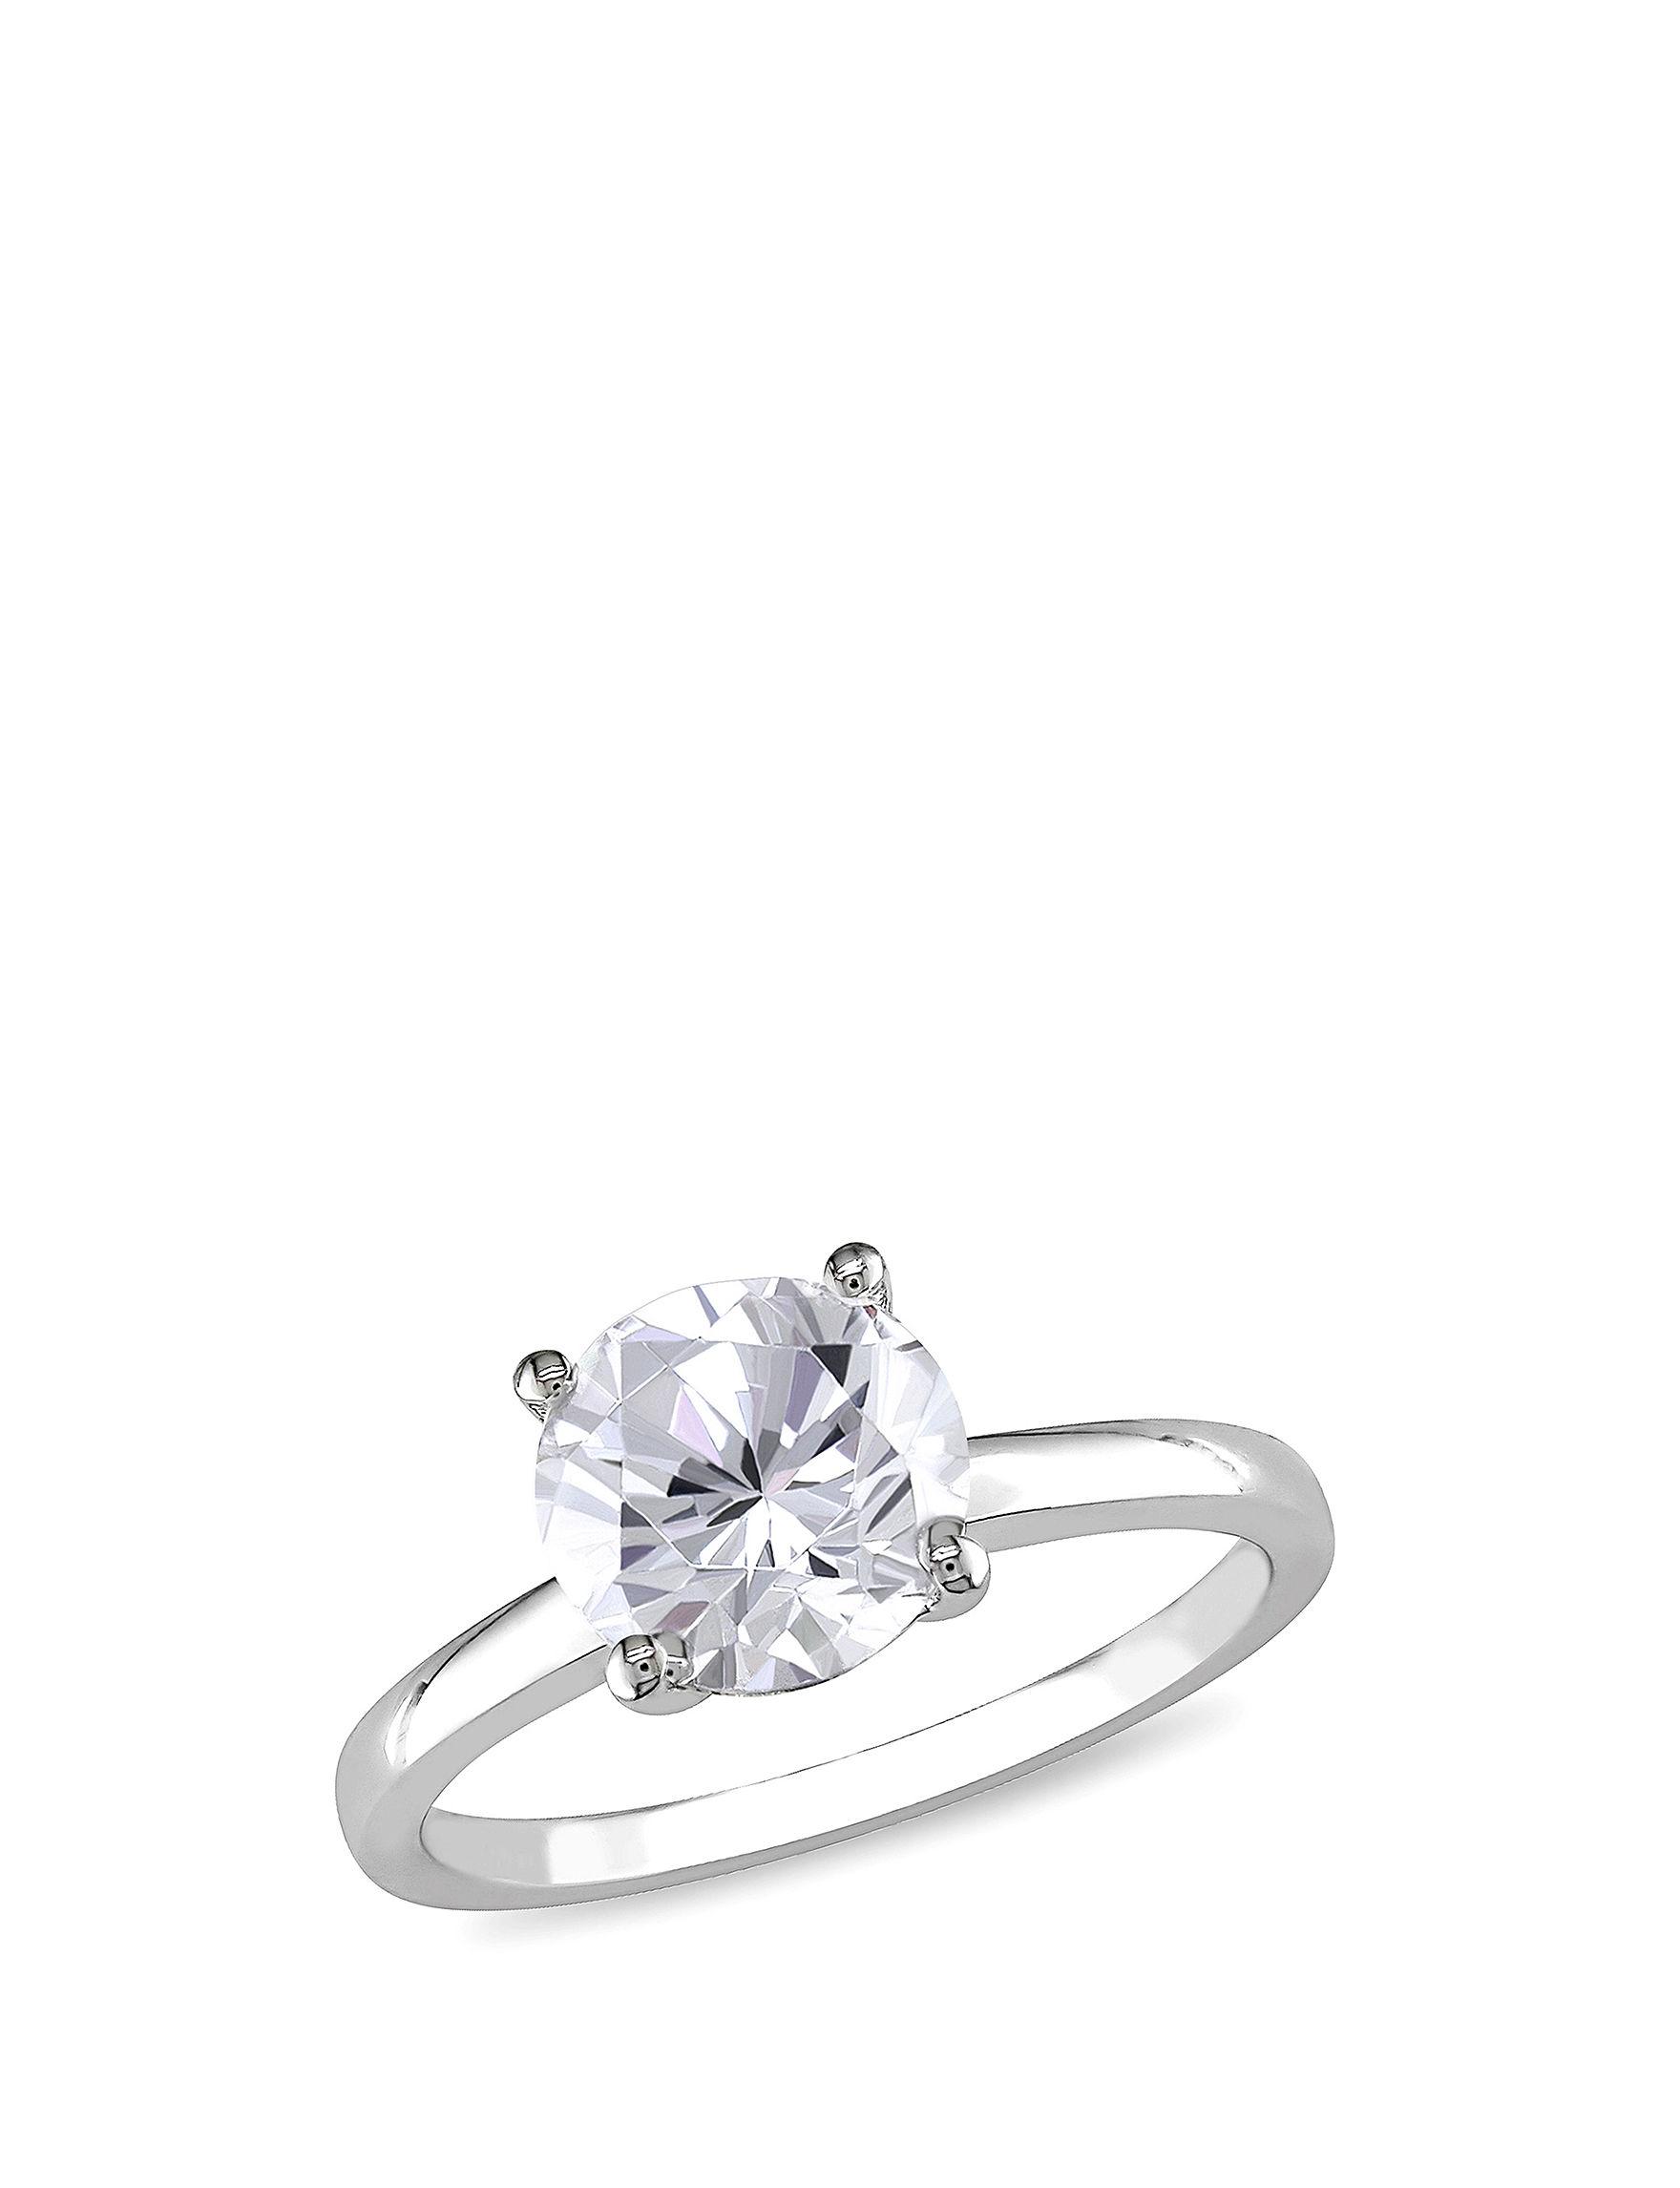 Sophia B White Gold Rings Fine Jewelry